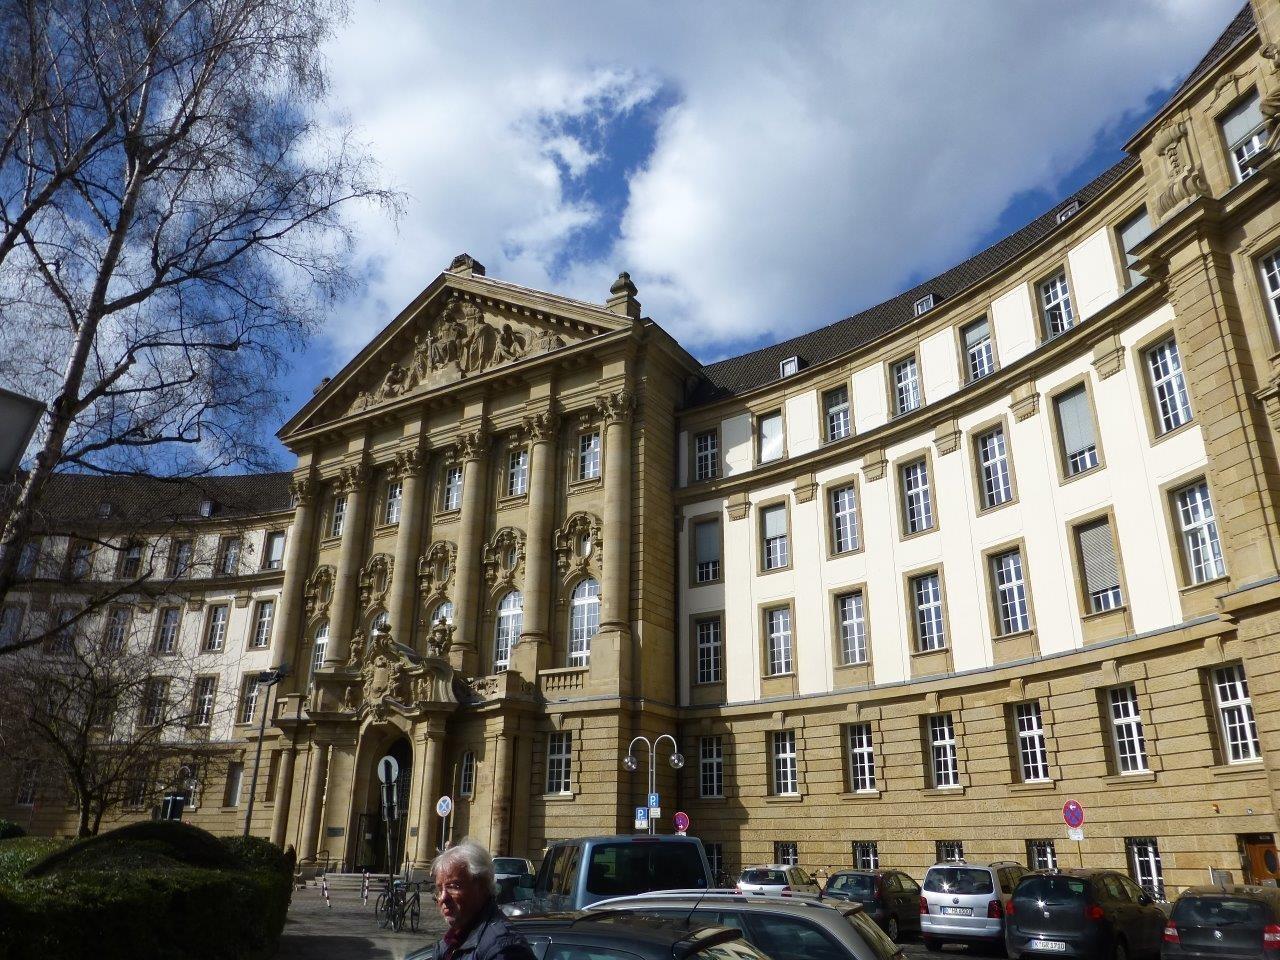 bibliothek olg köln - franke architektur | innenarchitektur, Innenarchitektur ideen